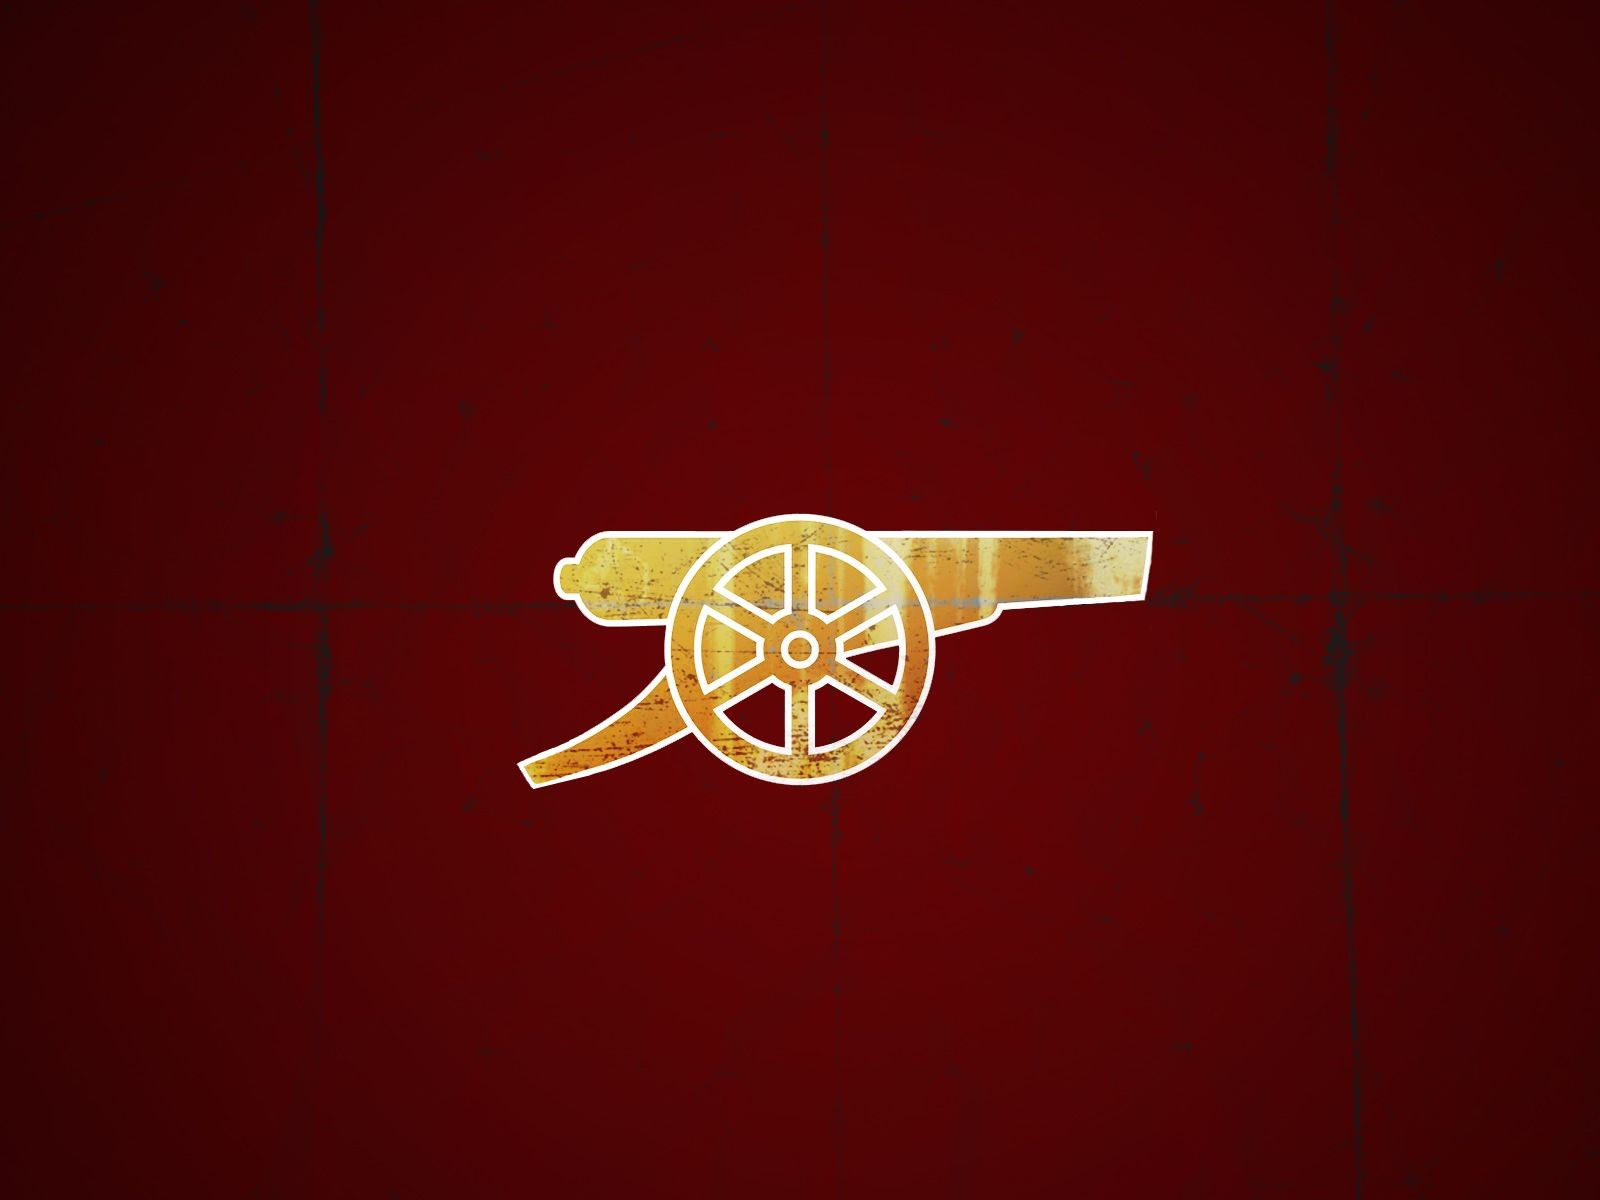 Arsenal Profile 1600x1200 Download Hd Wallpaper Wallpapertip